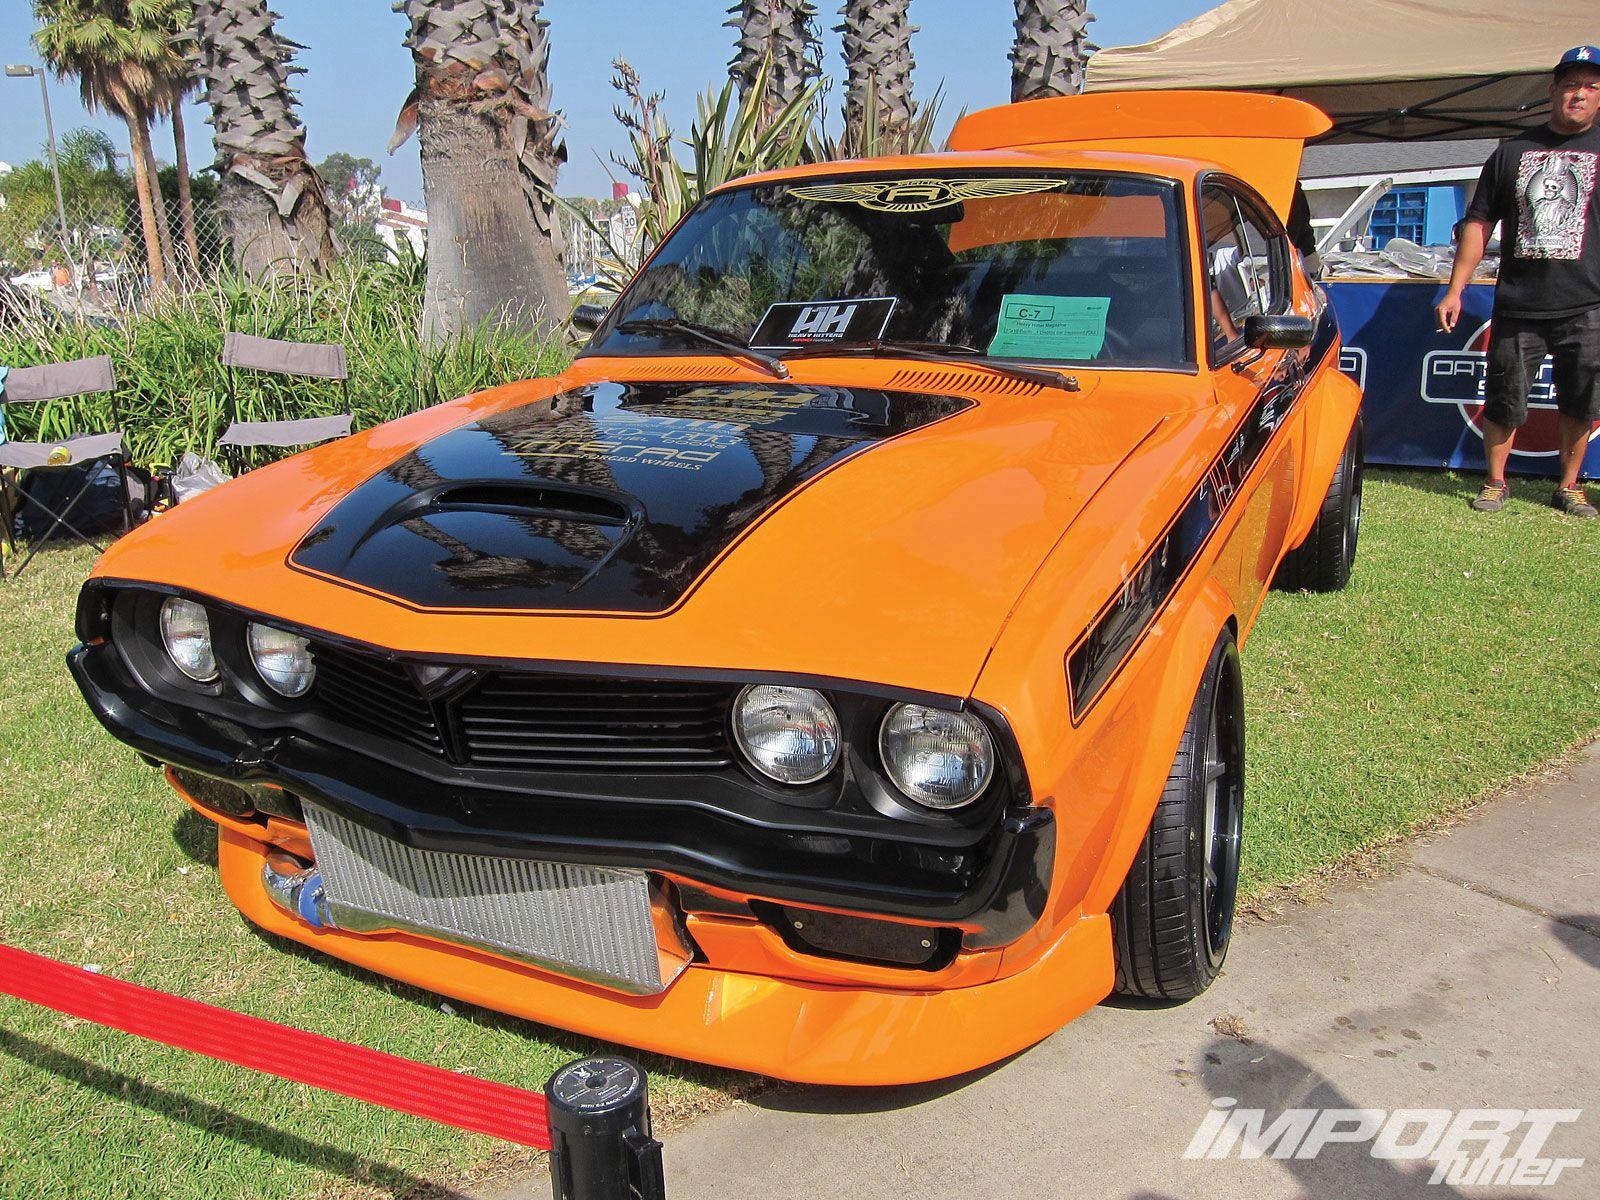 Nissian Gtr Japanese Classic Car Nice Hot Cars Pinterest